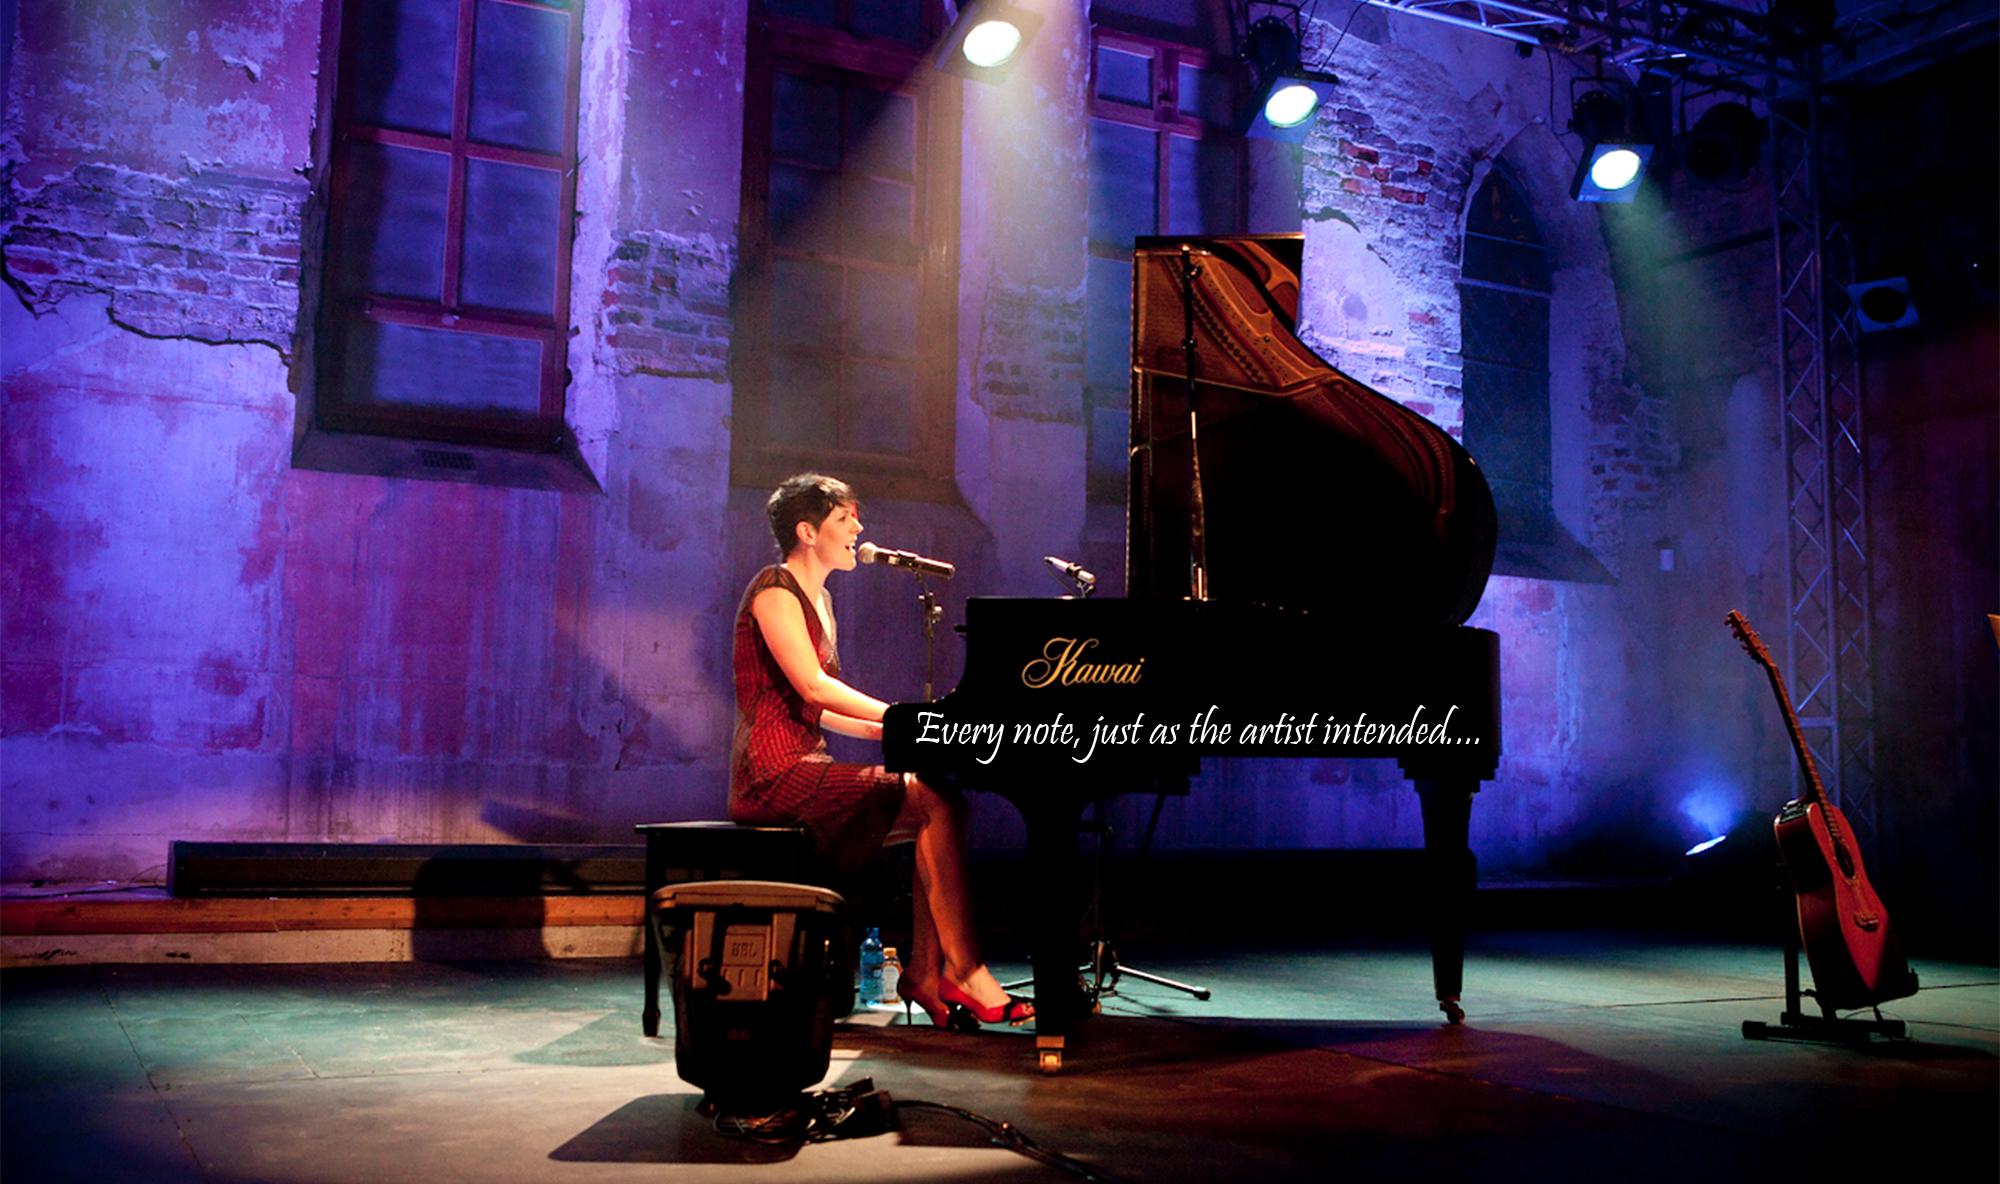 Pianist2000px.jpg